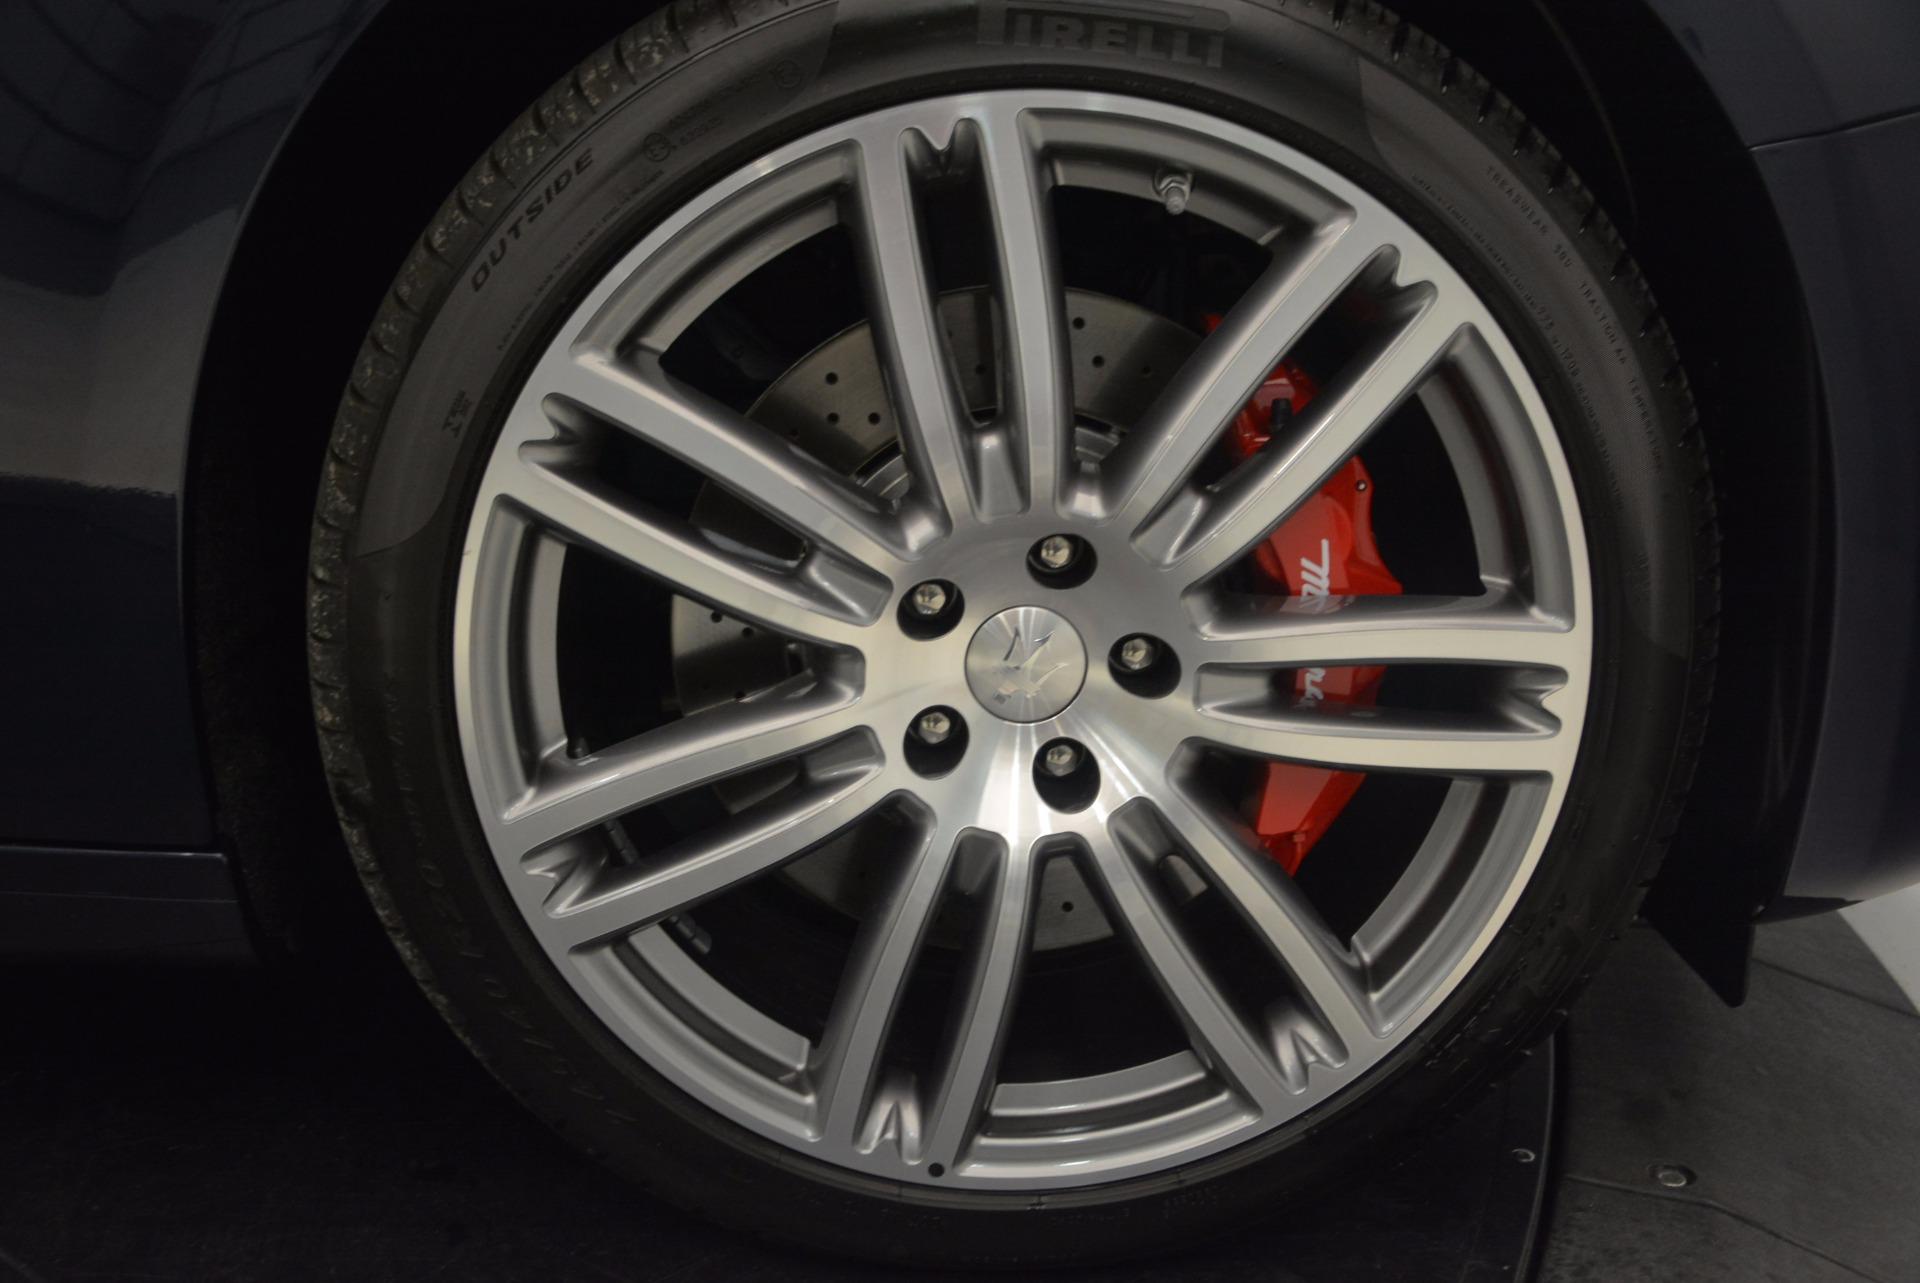 New 2018 Maserati Ghibli S Q4 Gransport For Sale In Greenwich, CT 1562_p26